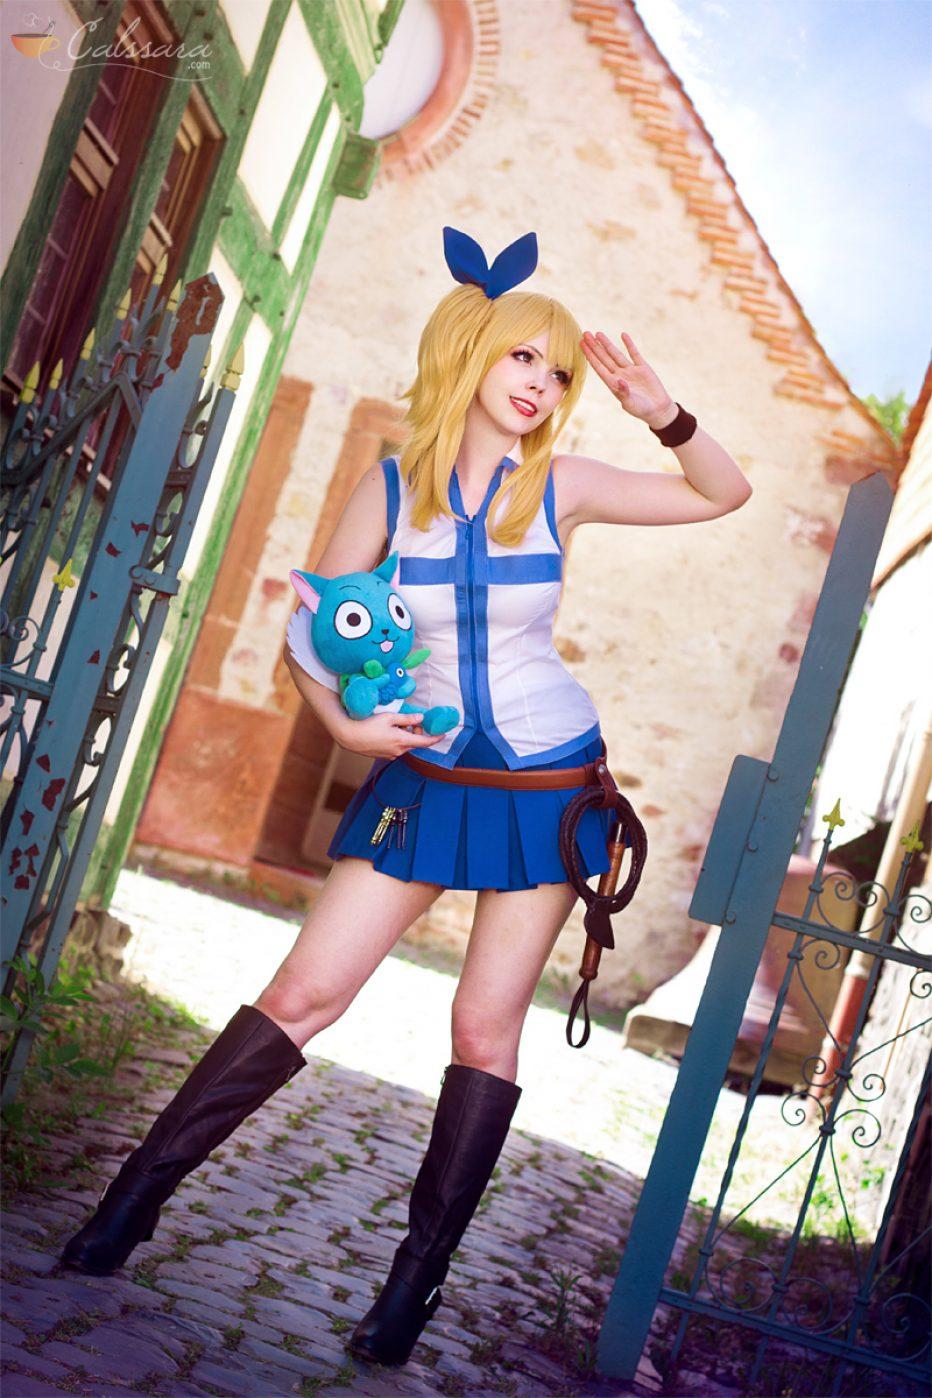 Fairy-Tail-Lucy-Heartfilia-Cosplay-Gamers-Heroes-1.jpg